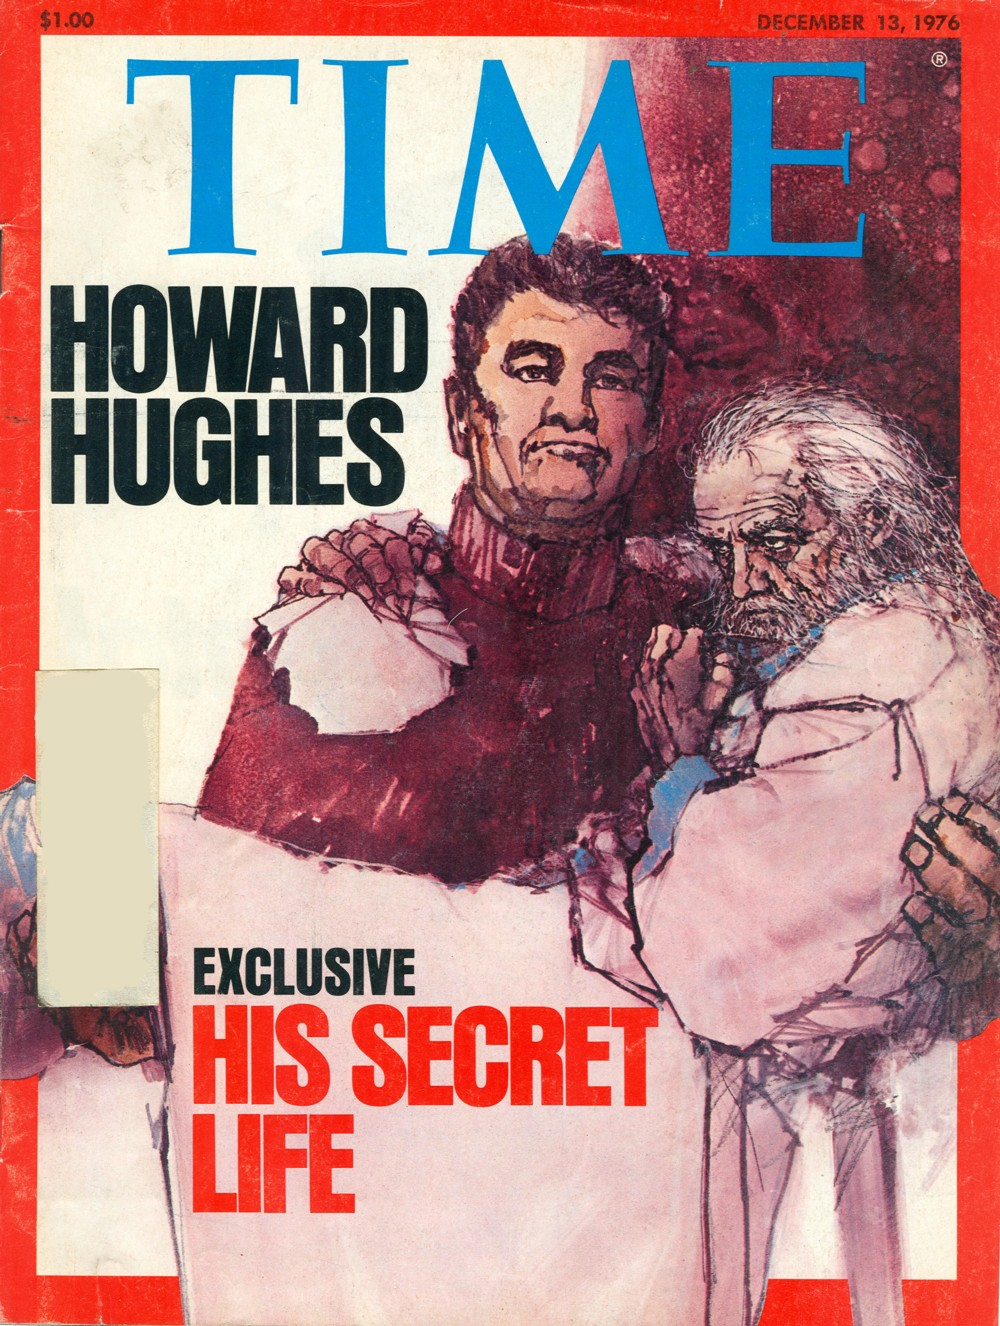 did howard hughes have ocd